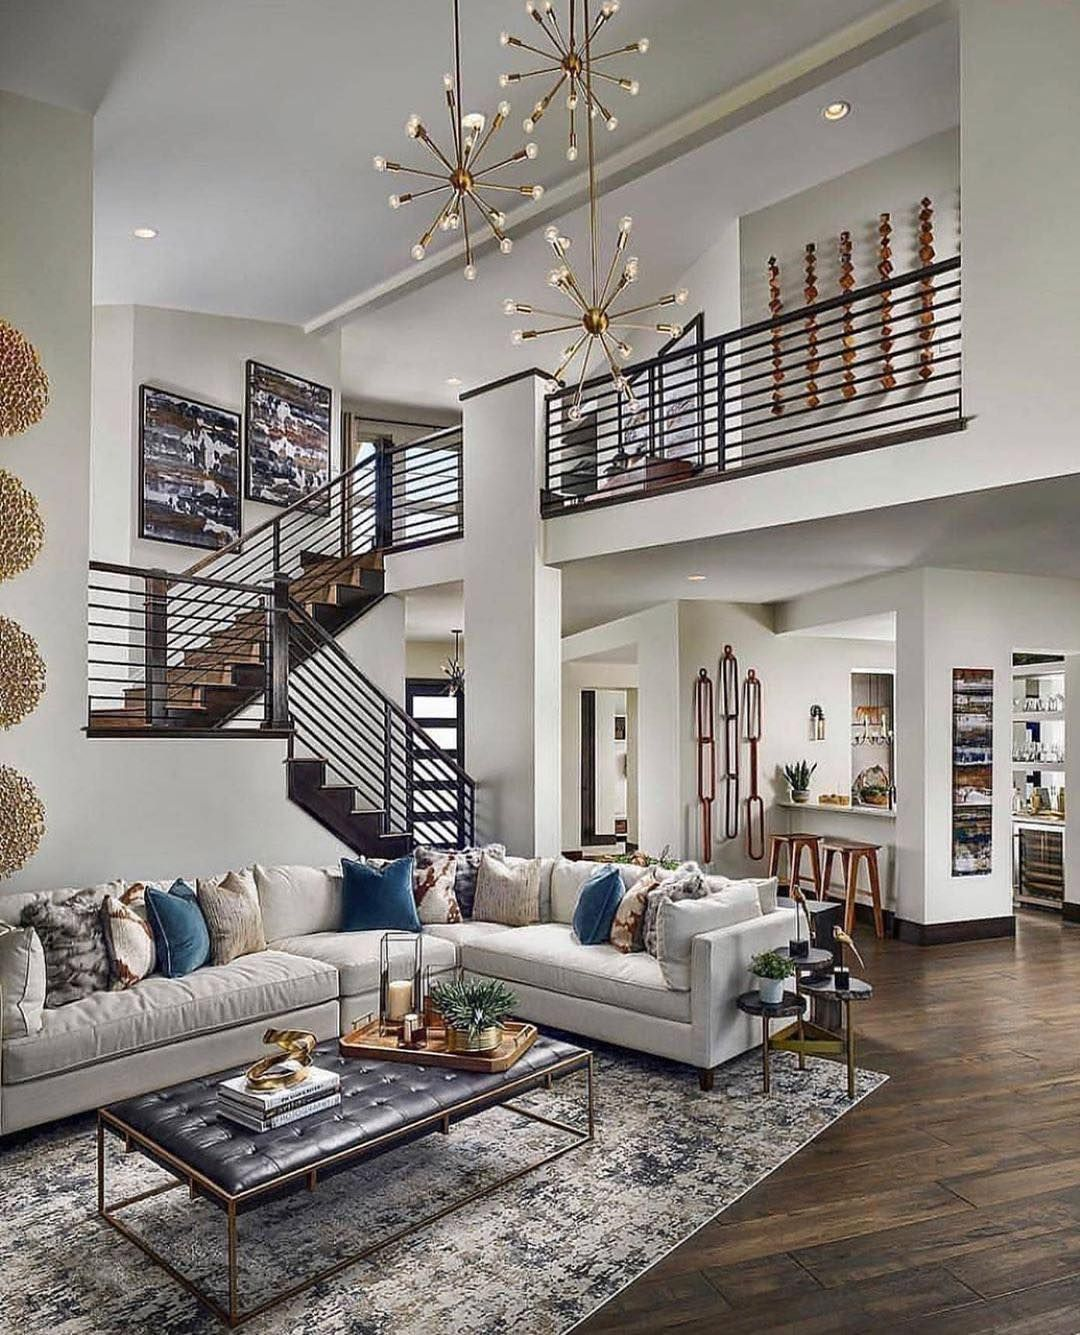 31 Admirable Modern Living Room Design Ideas You Should Copy Homyhomee Living Room Design Modern Living Room Decor Apartment Living Room Scandinavian